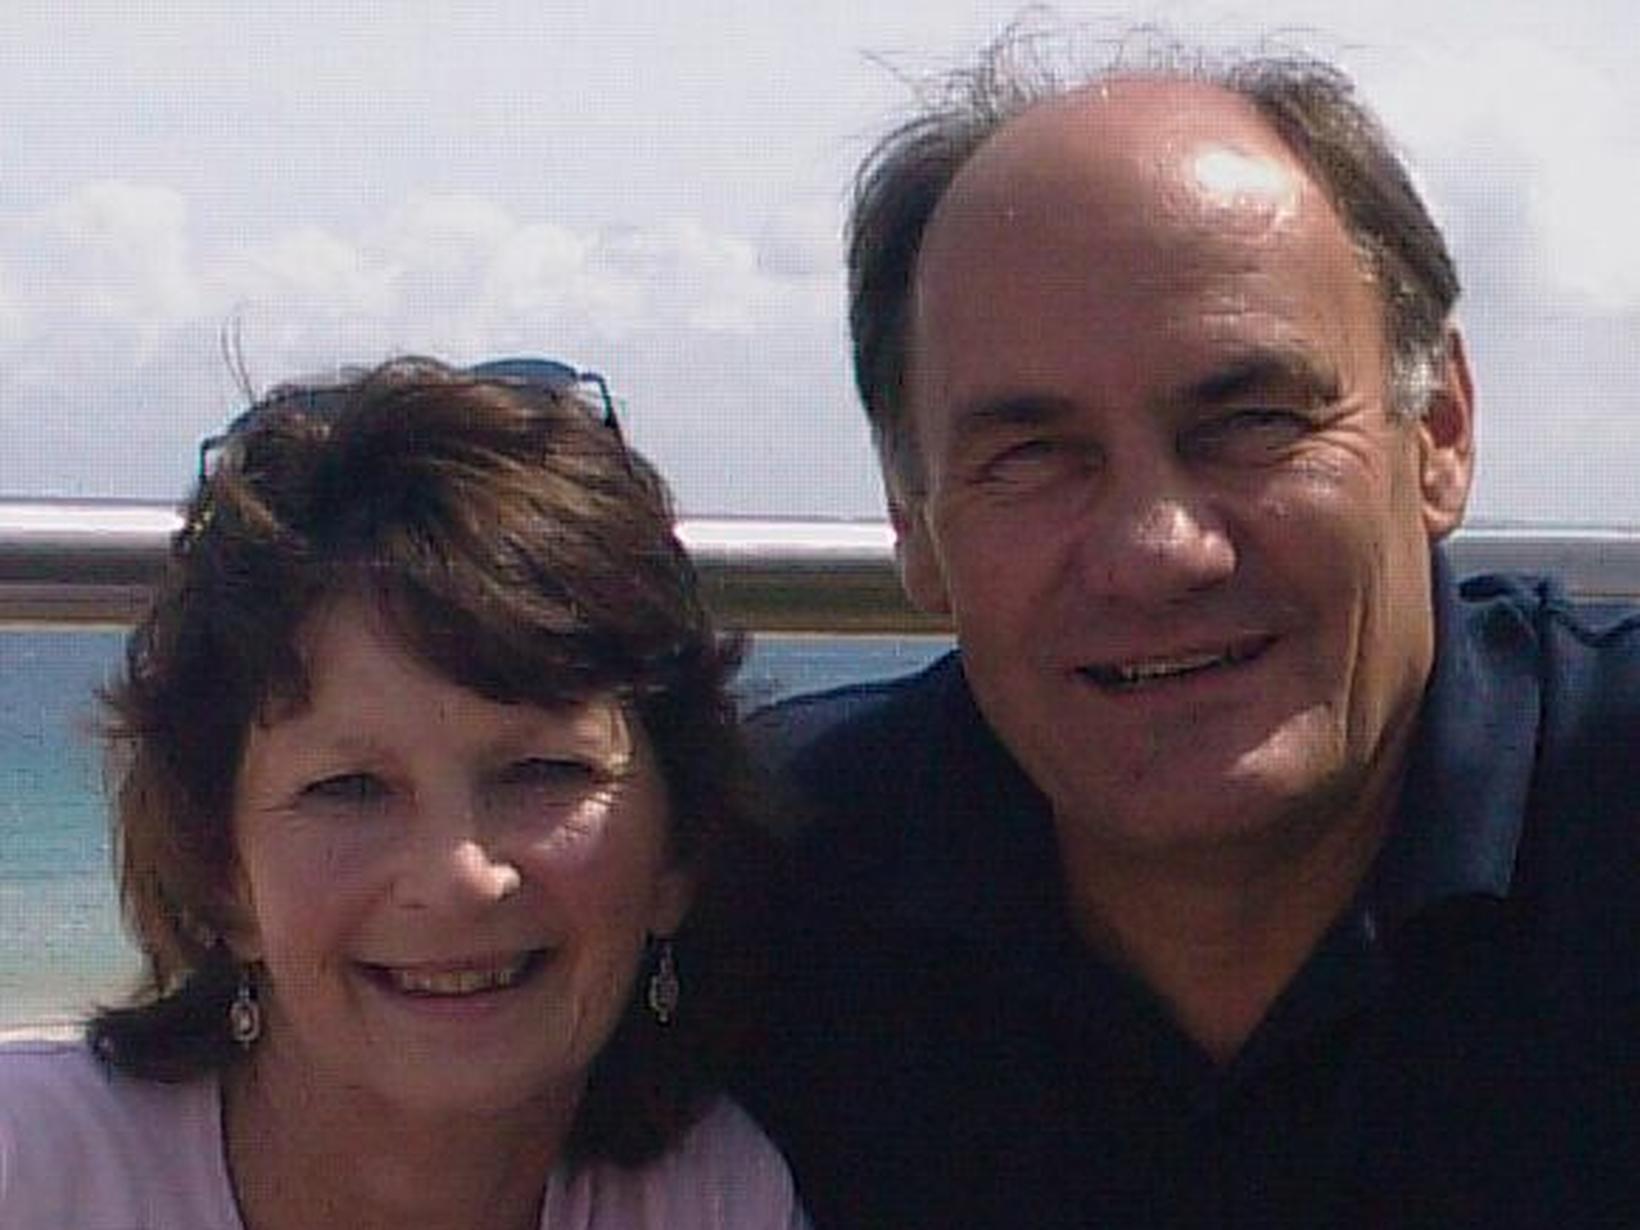 Pam & Paul from Nancy, France